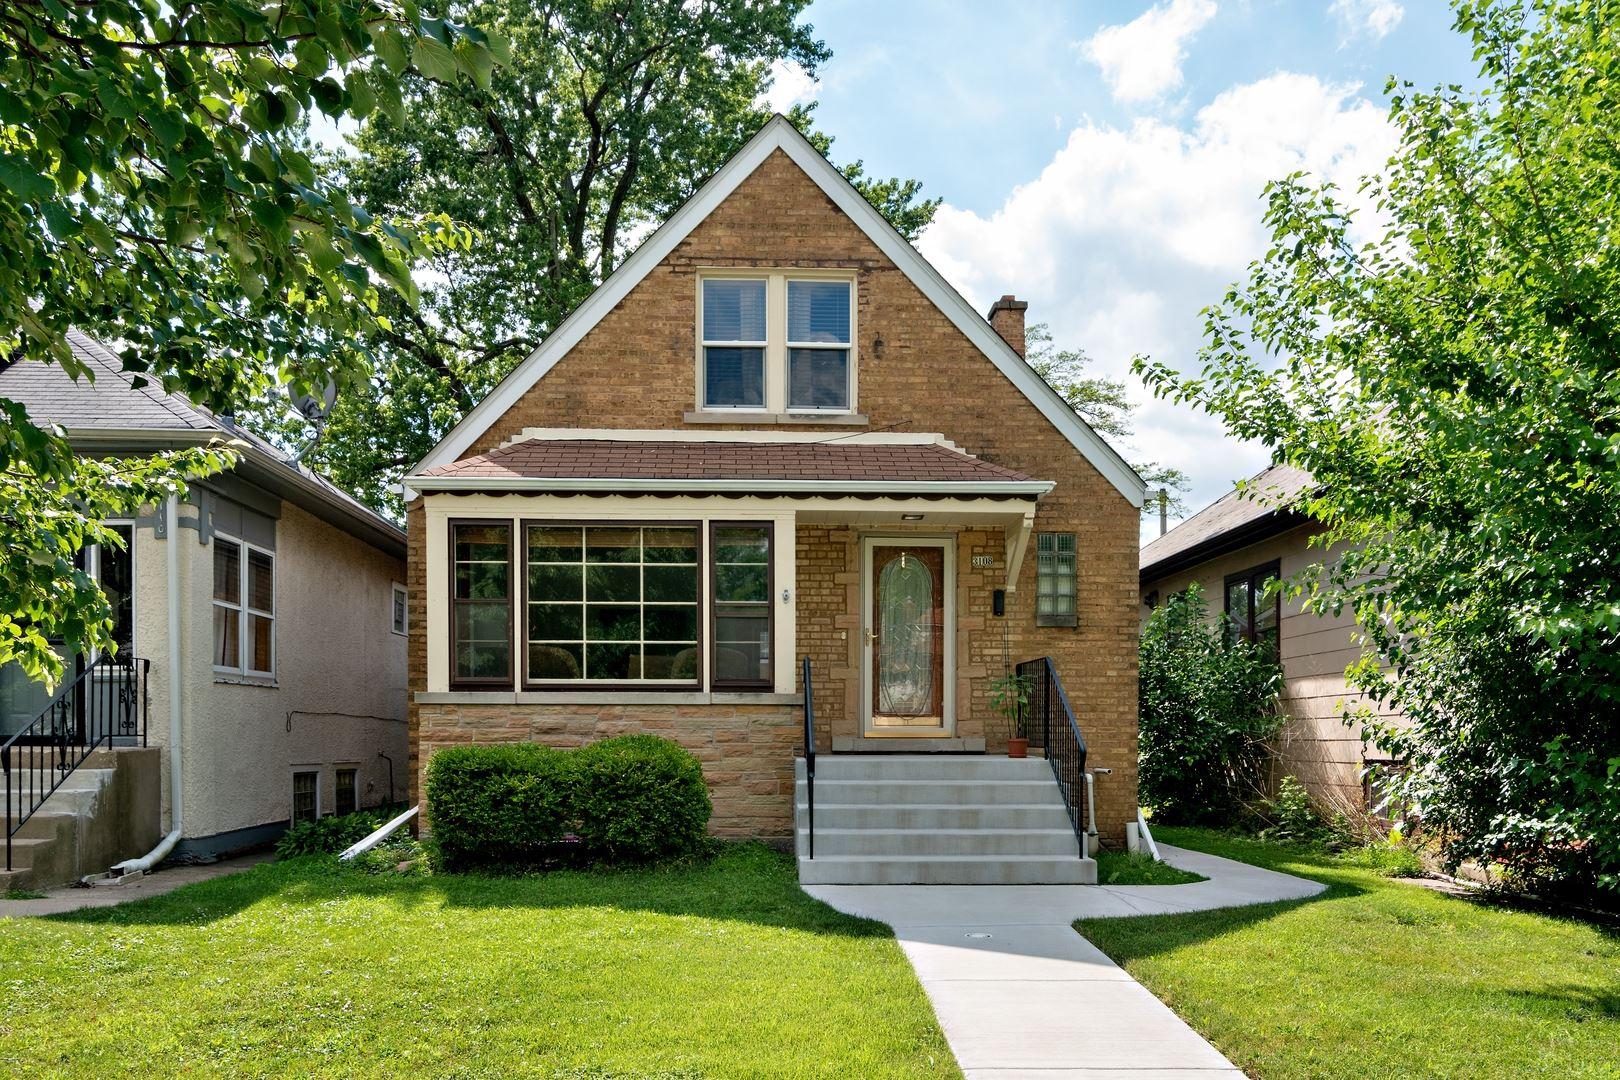 3108 Oak Avenue, Brookfield, IL 60513 - #: 10785469